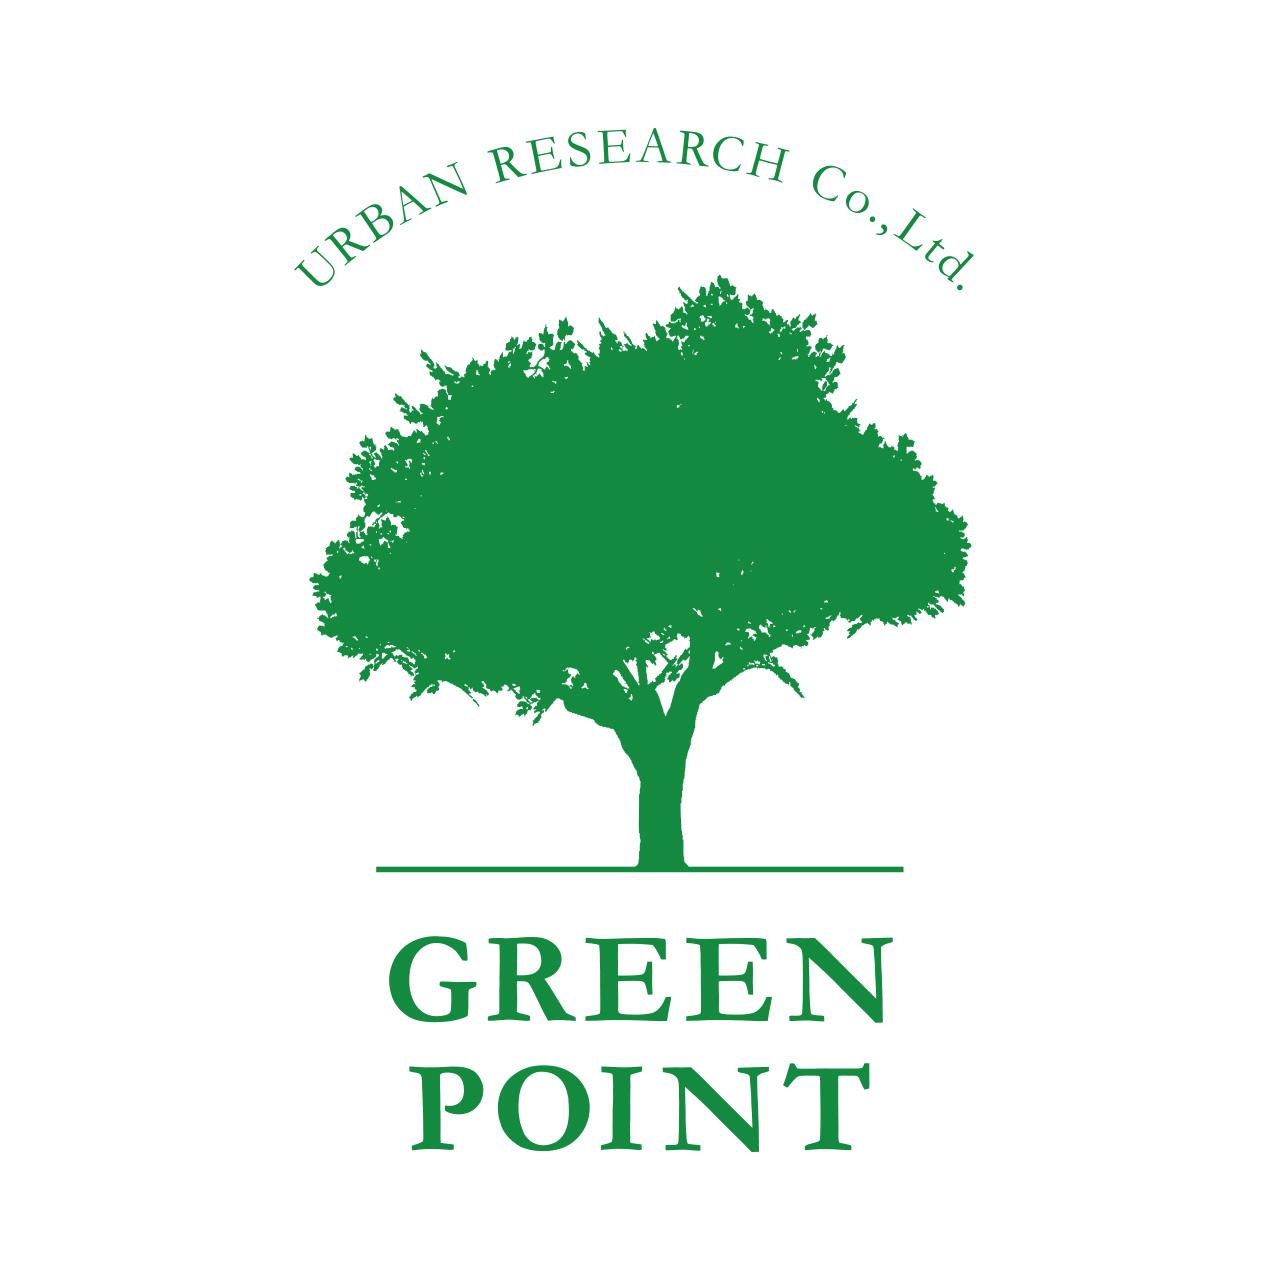 UR CLUB GREEN POINTサービスについて